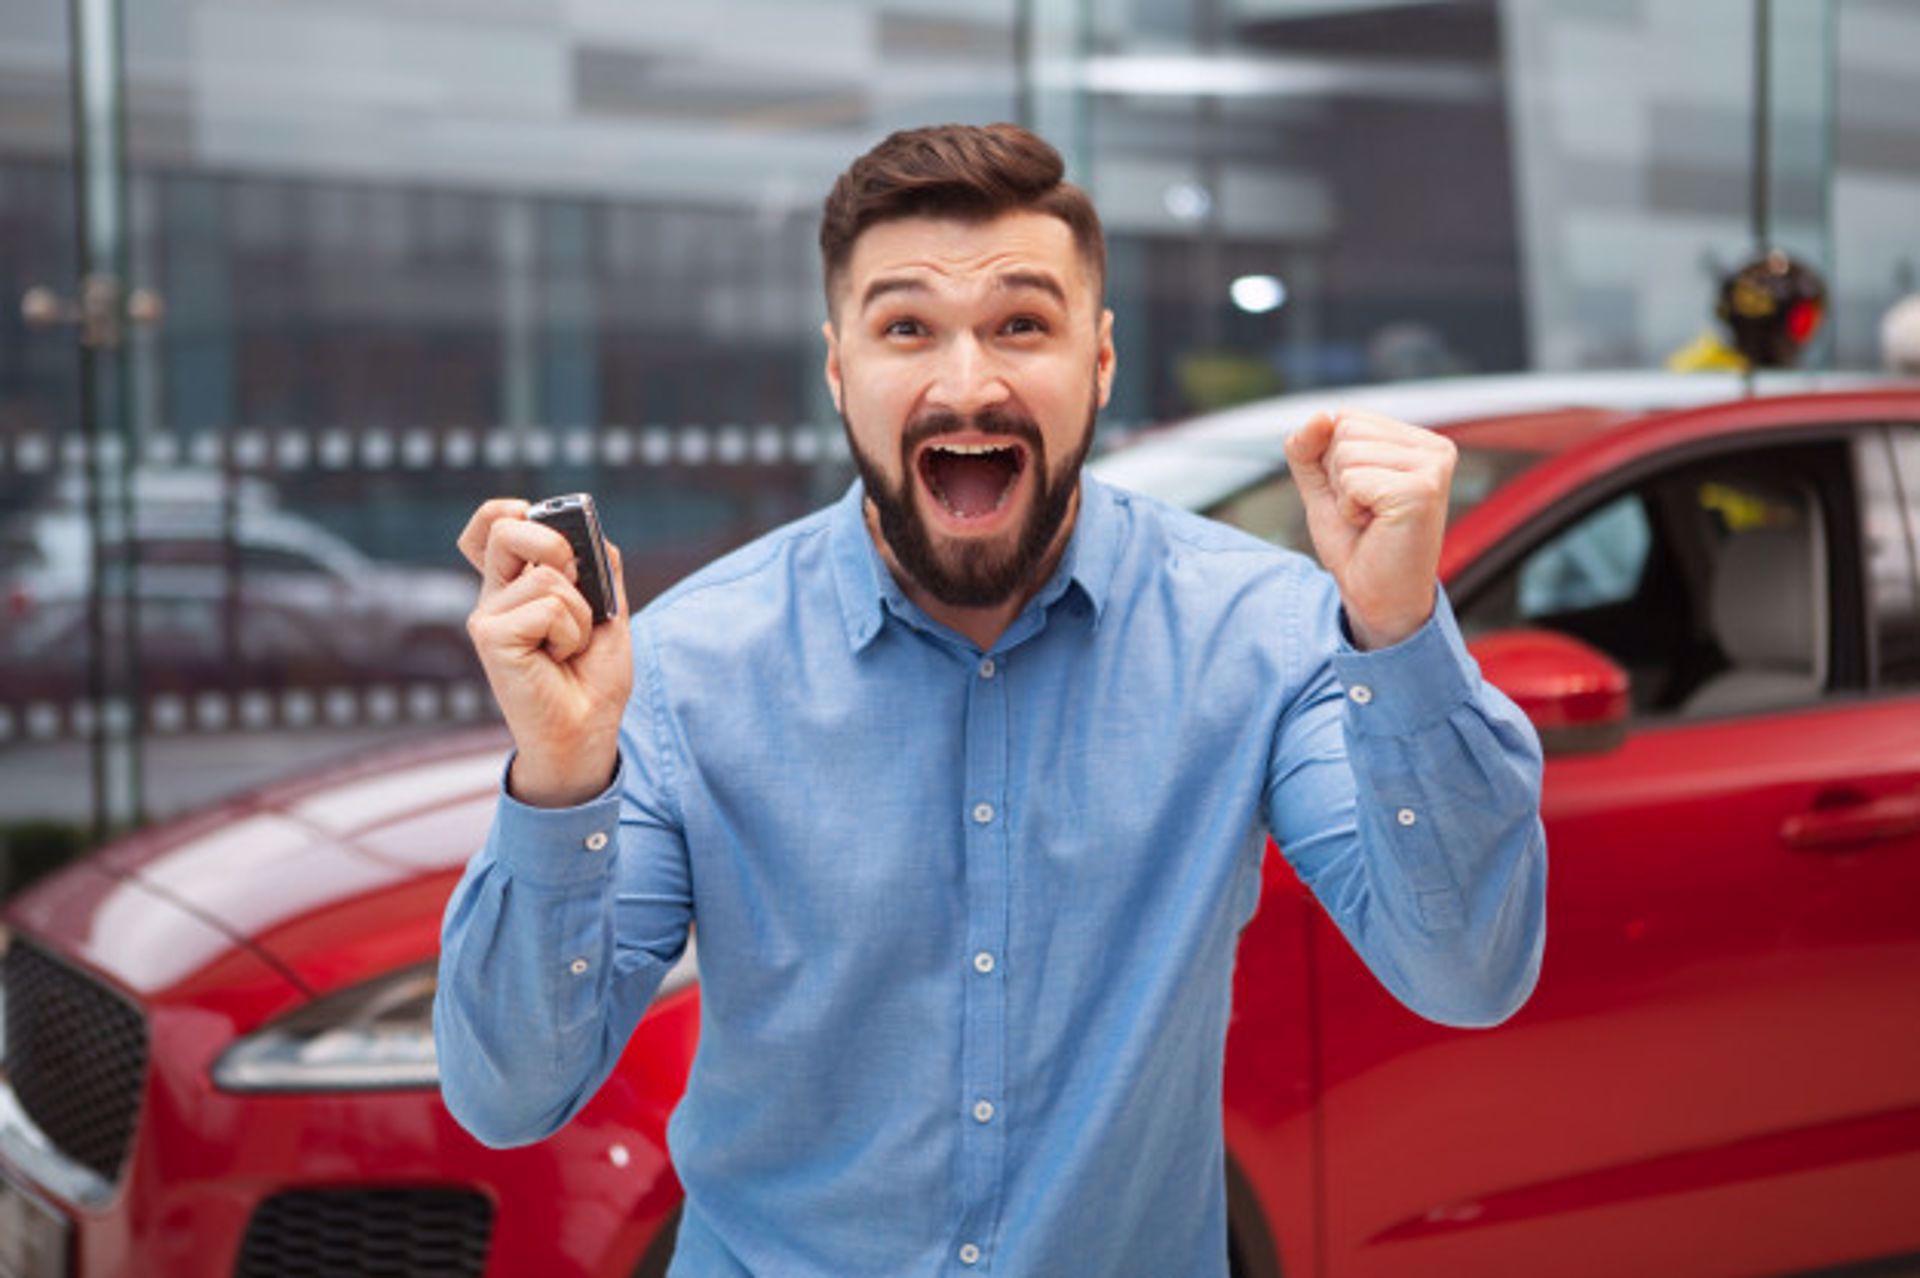 5 Easy Ways to Help Someone Car Shop